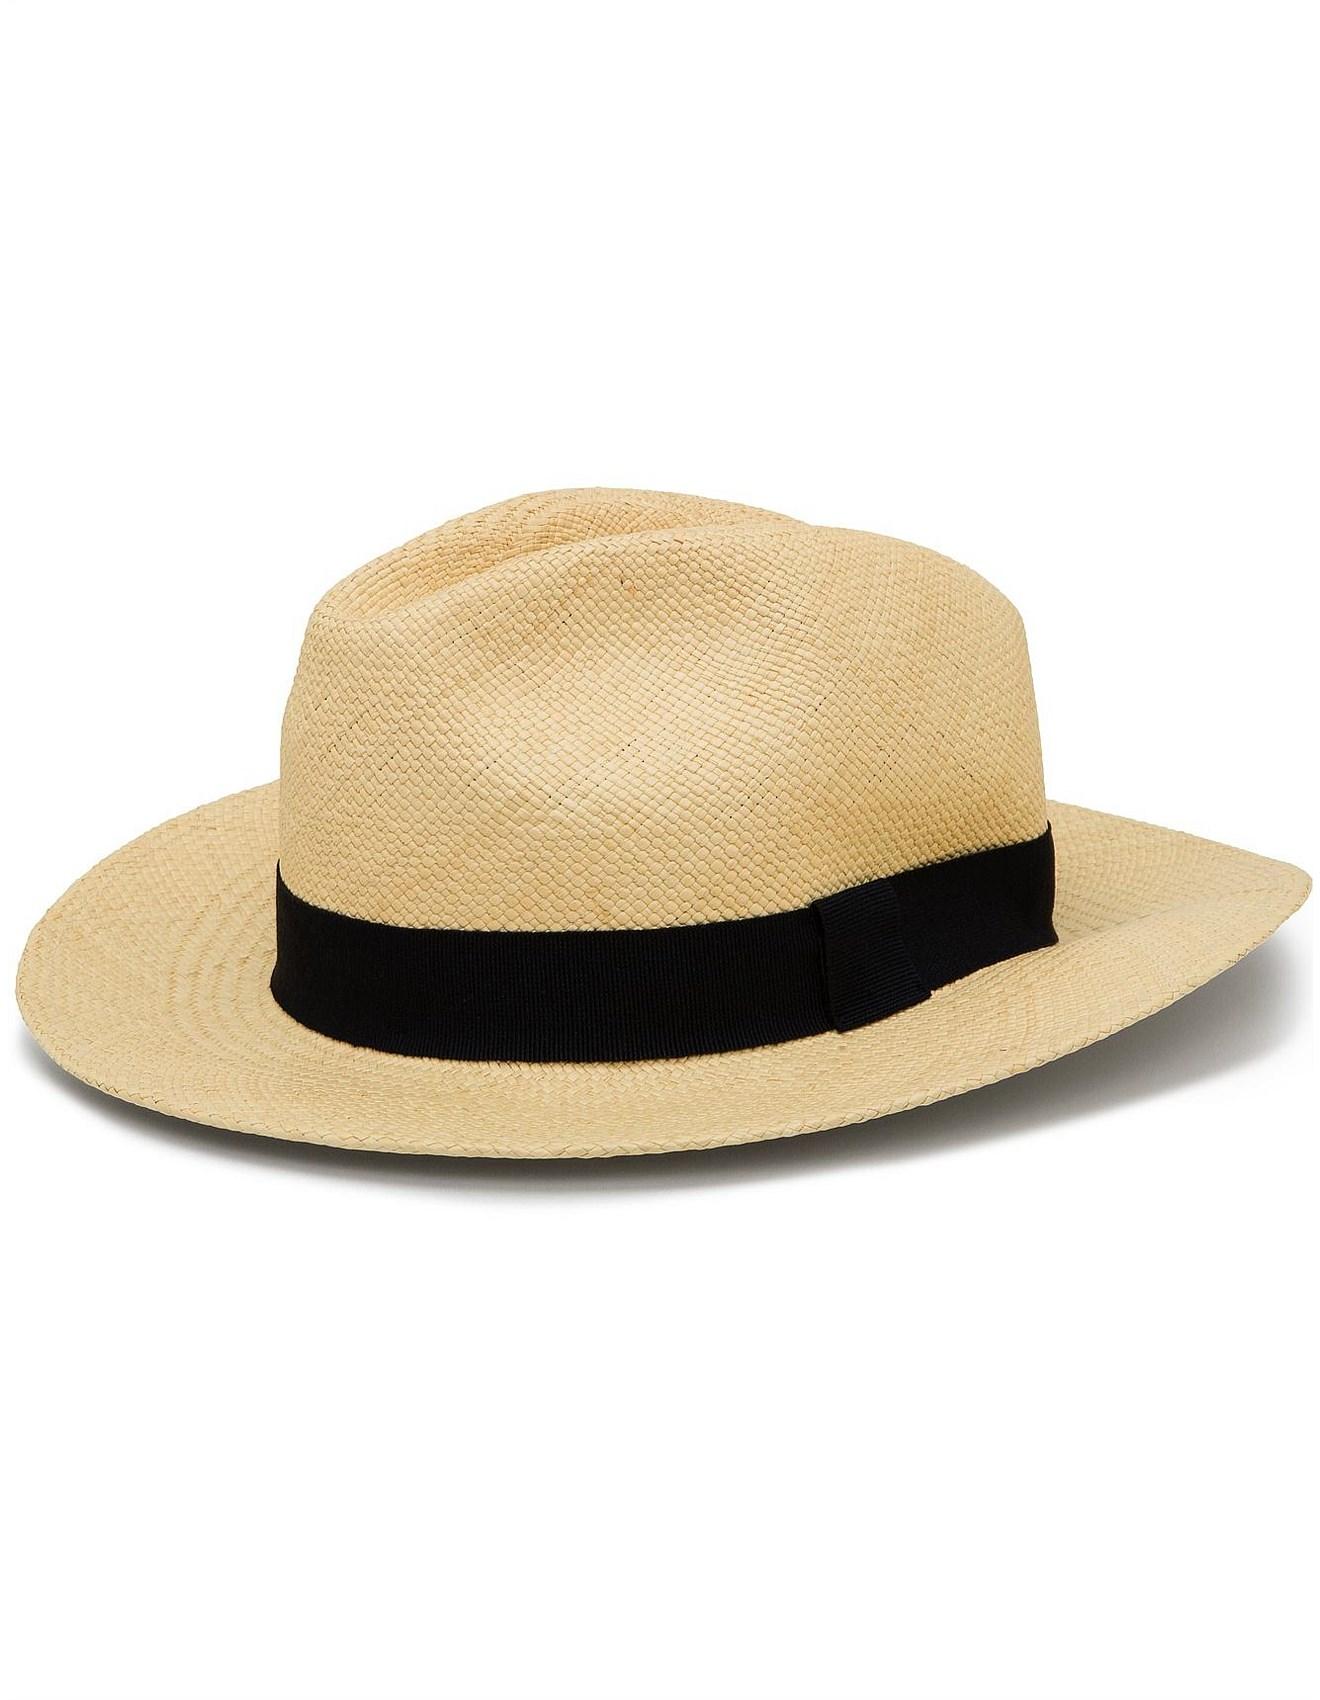 b52121e10dd52 Mens Accessories - STRAW MEN PANAMA HAT